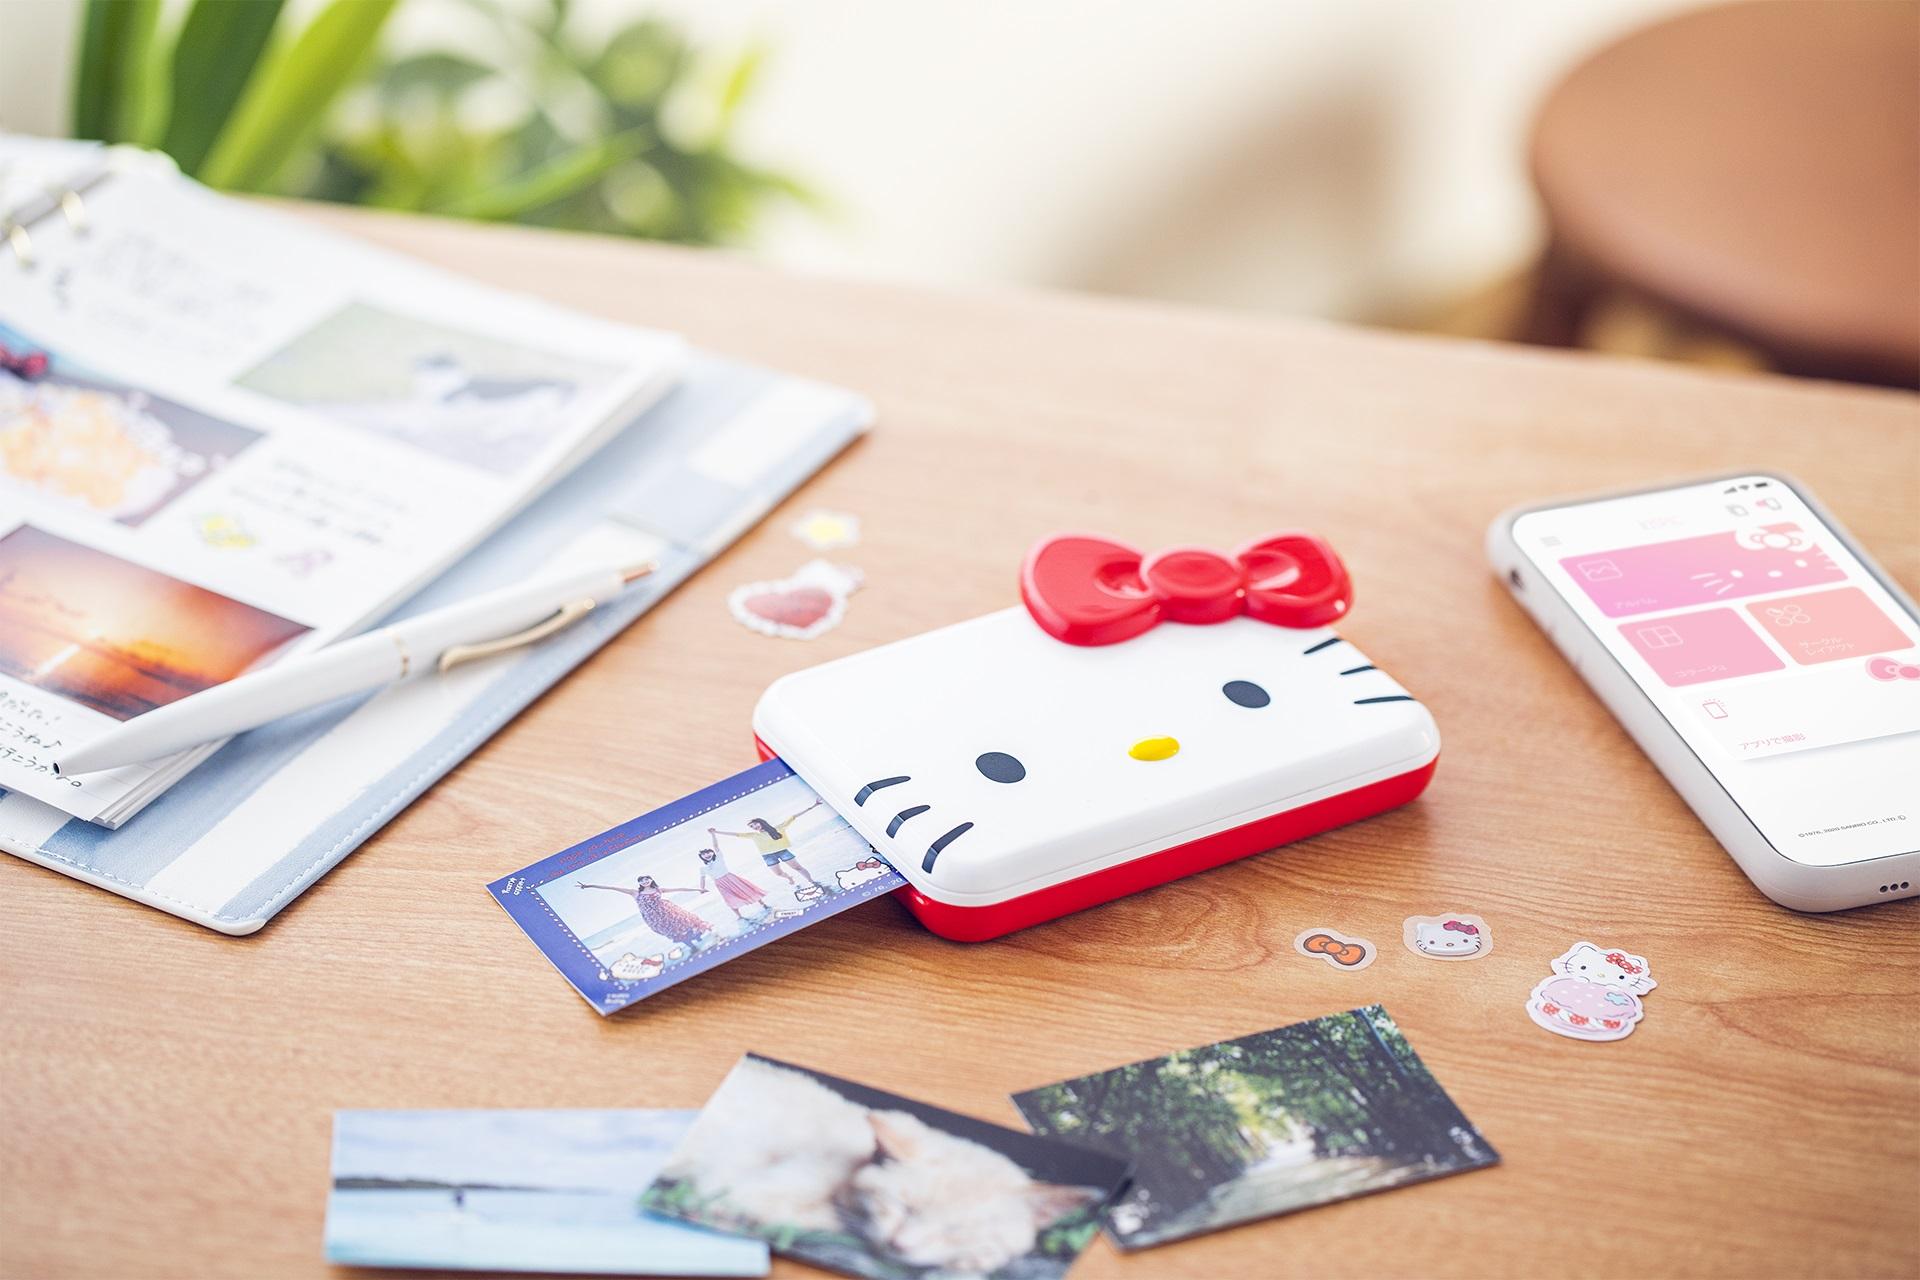 iNSPiC Hello Kitty ハローキティ 凱蒂貓7